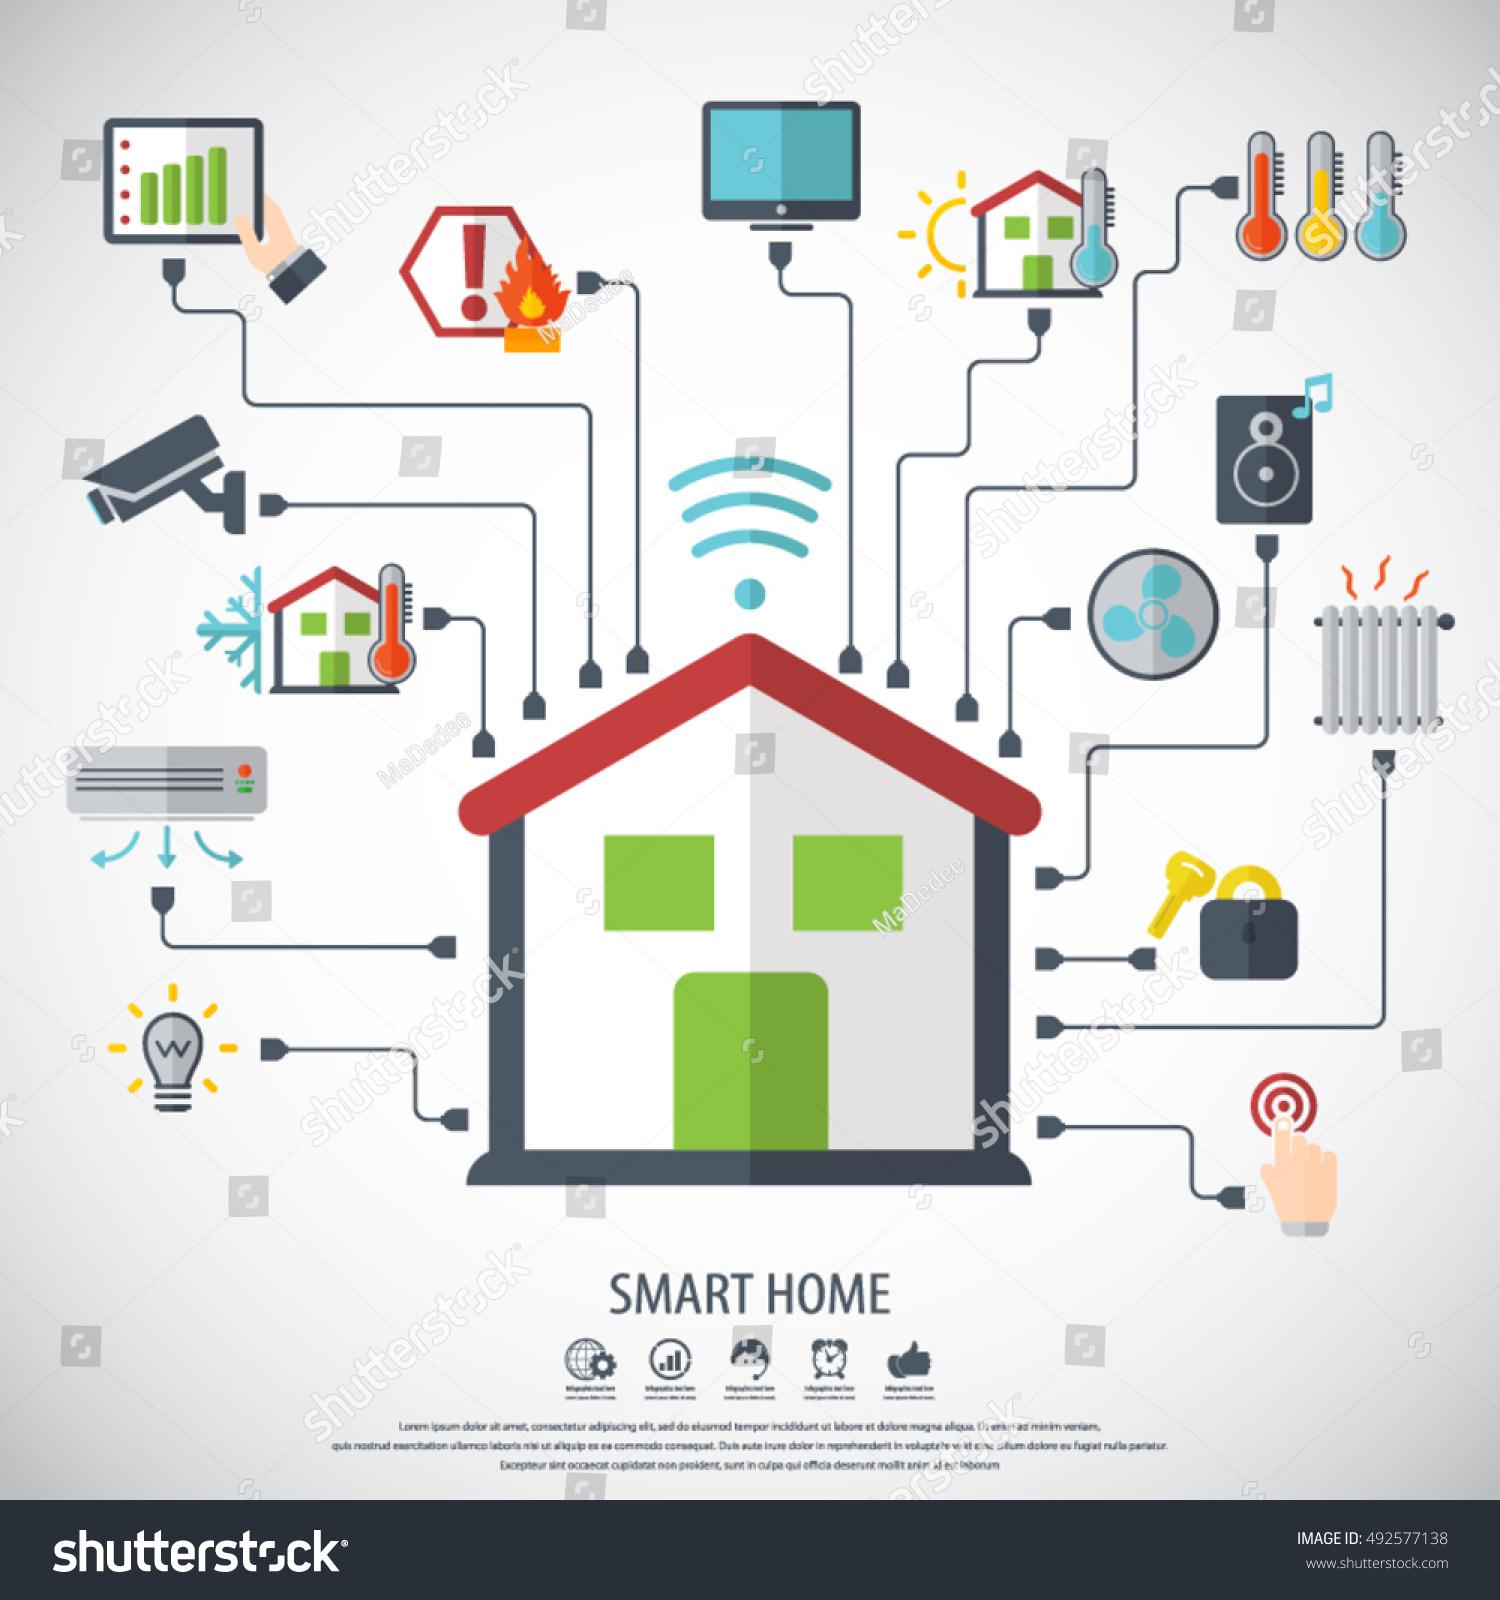 Smart Home Flat Design Style Vector Stock Vector 492577138 ...